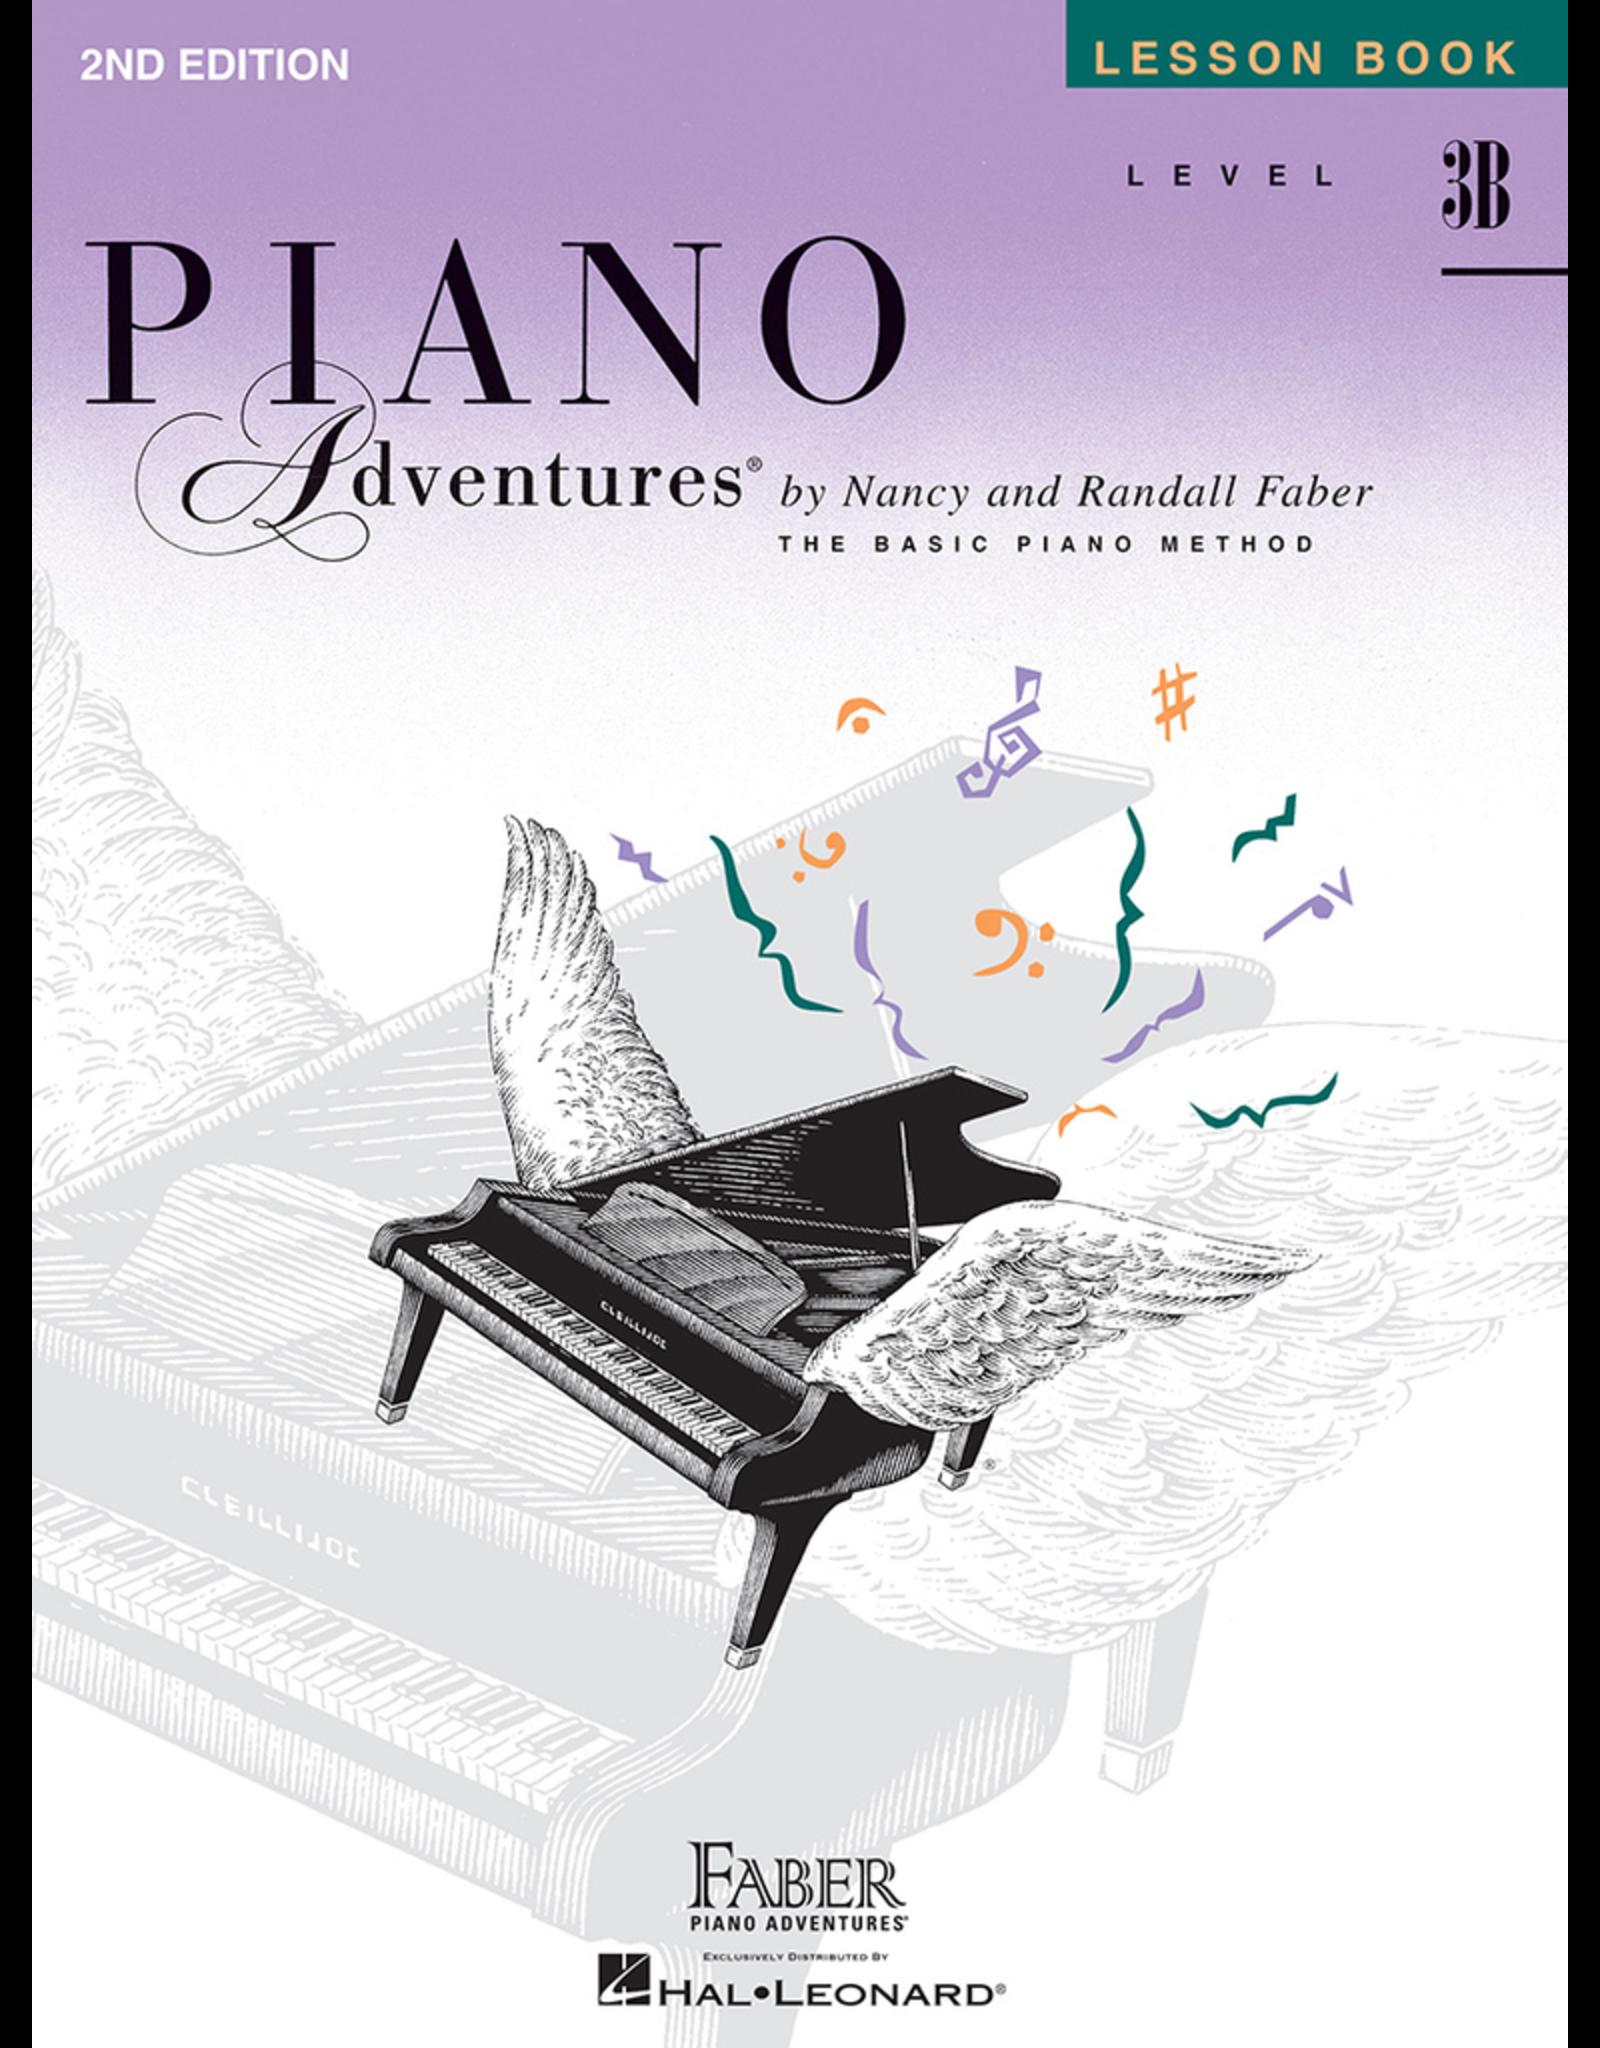 Hal Leonard Piano Adventures Lesson Book Level 3B *